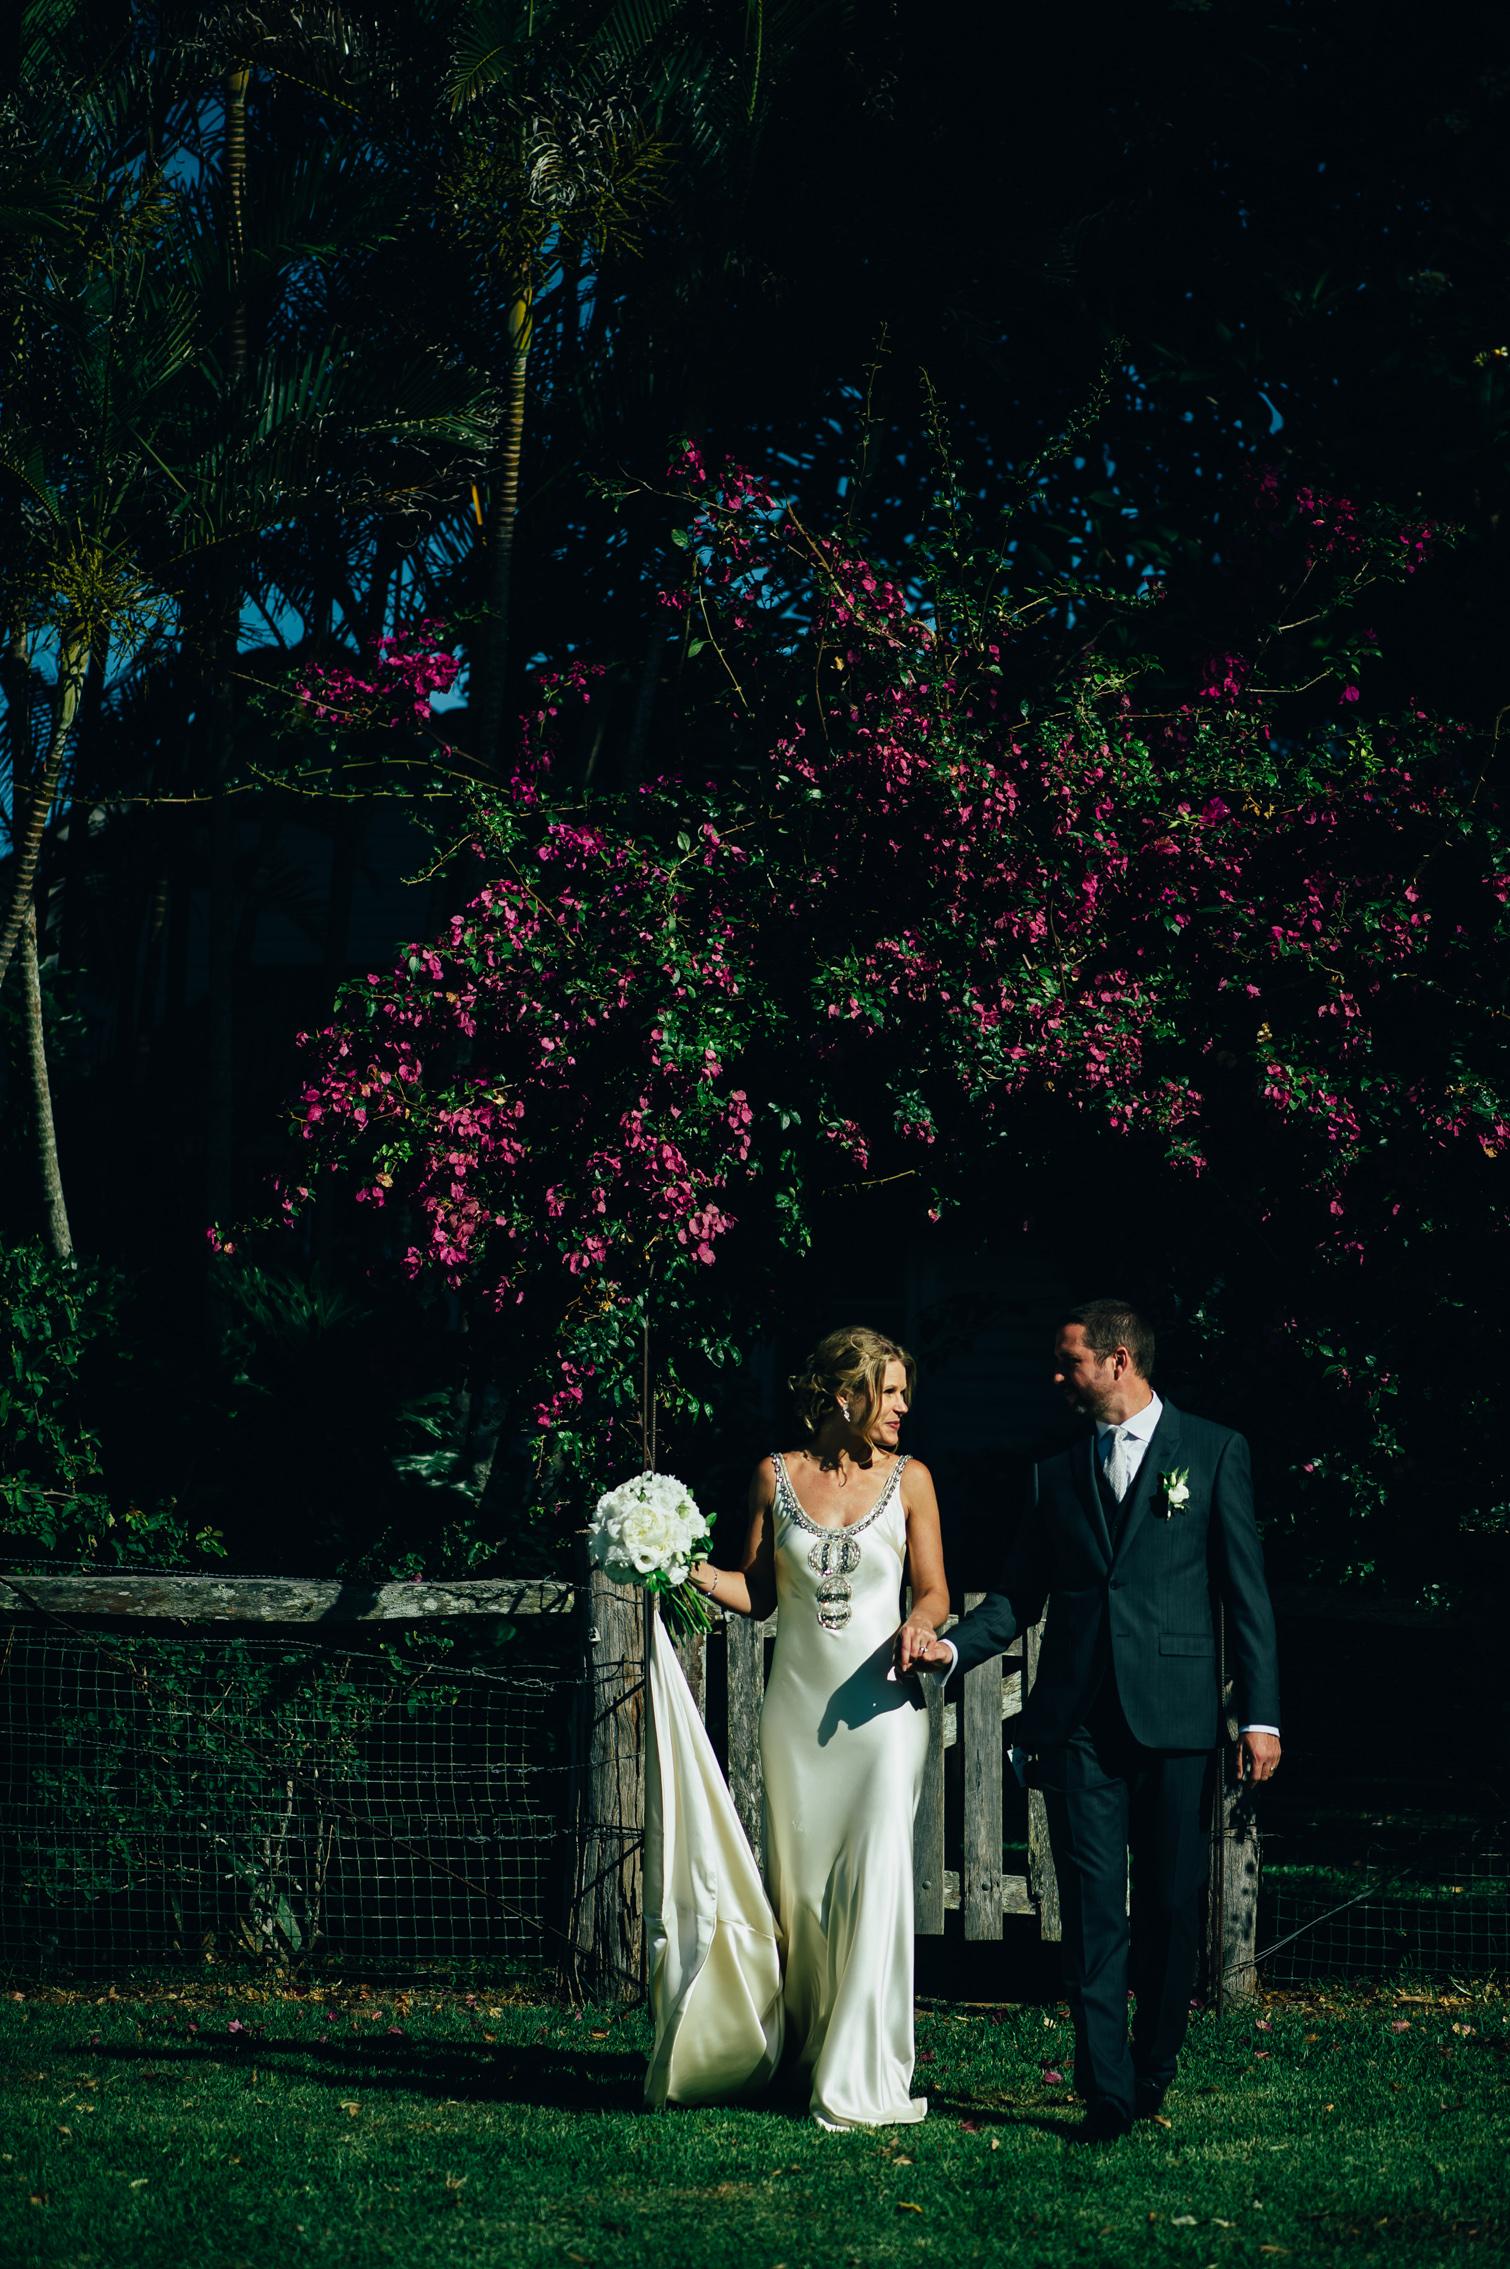 Byron_View_Wedding_Venue-30.jpg